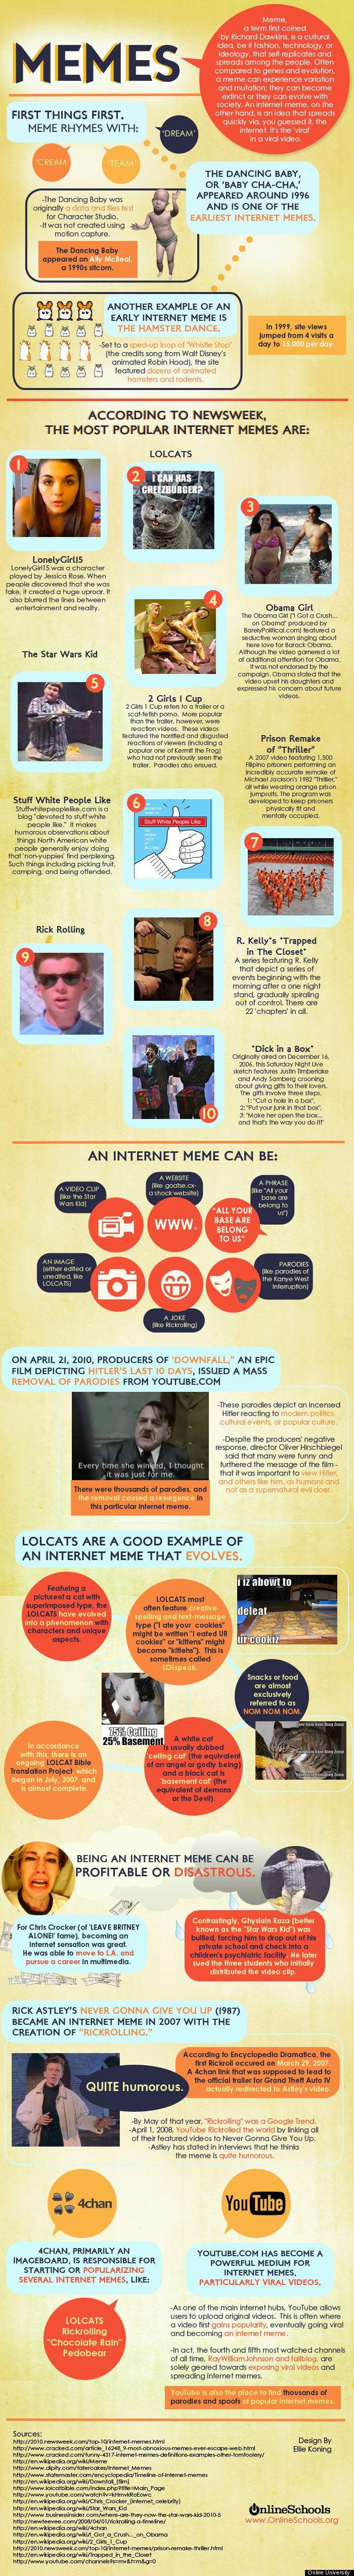 Internet Memes Infographic Internet Memes Social Media Infographic Infographic